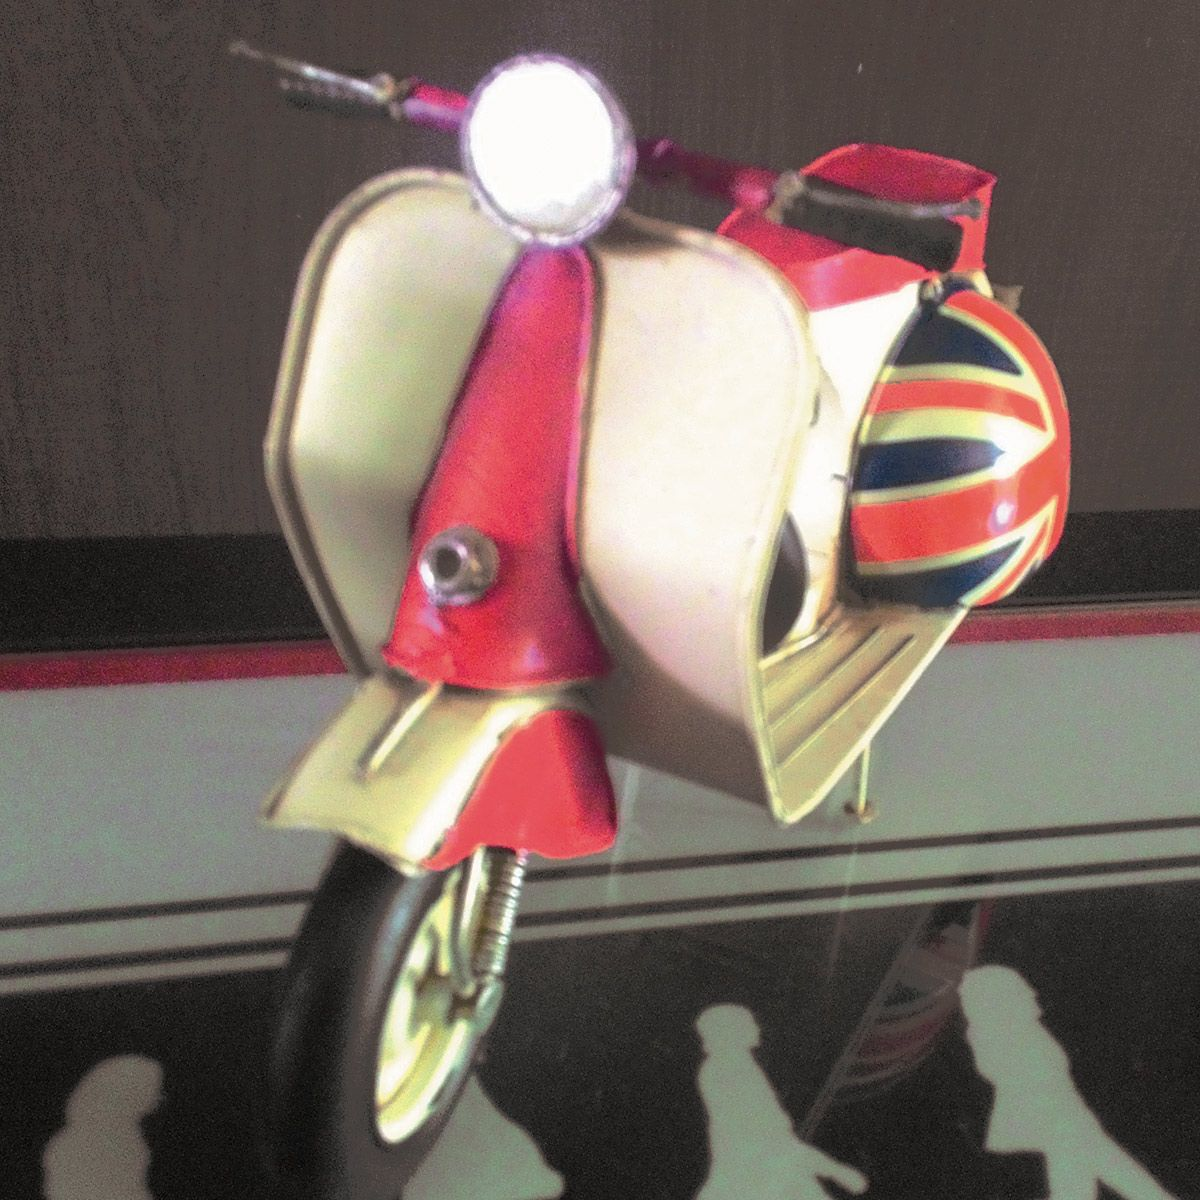 Moto Vintage Retrô Réplica Vespa Londres